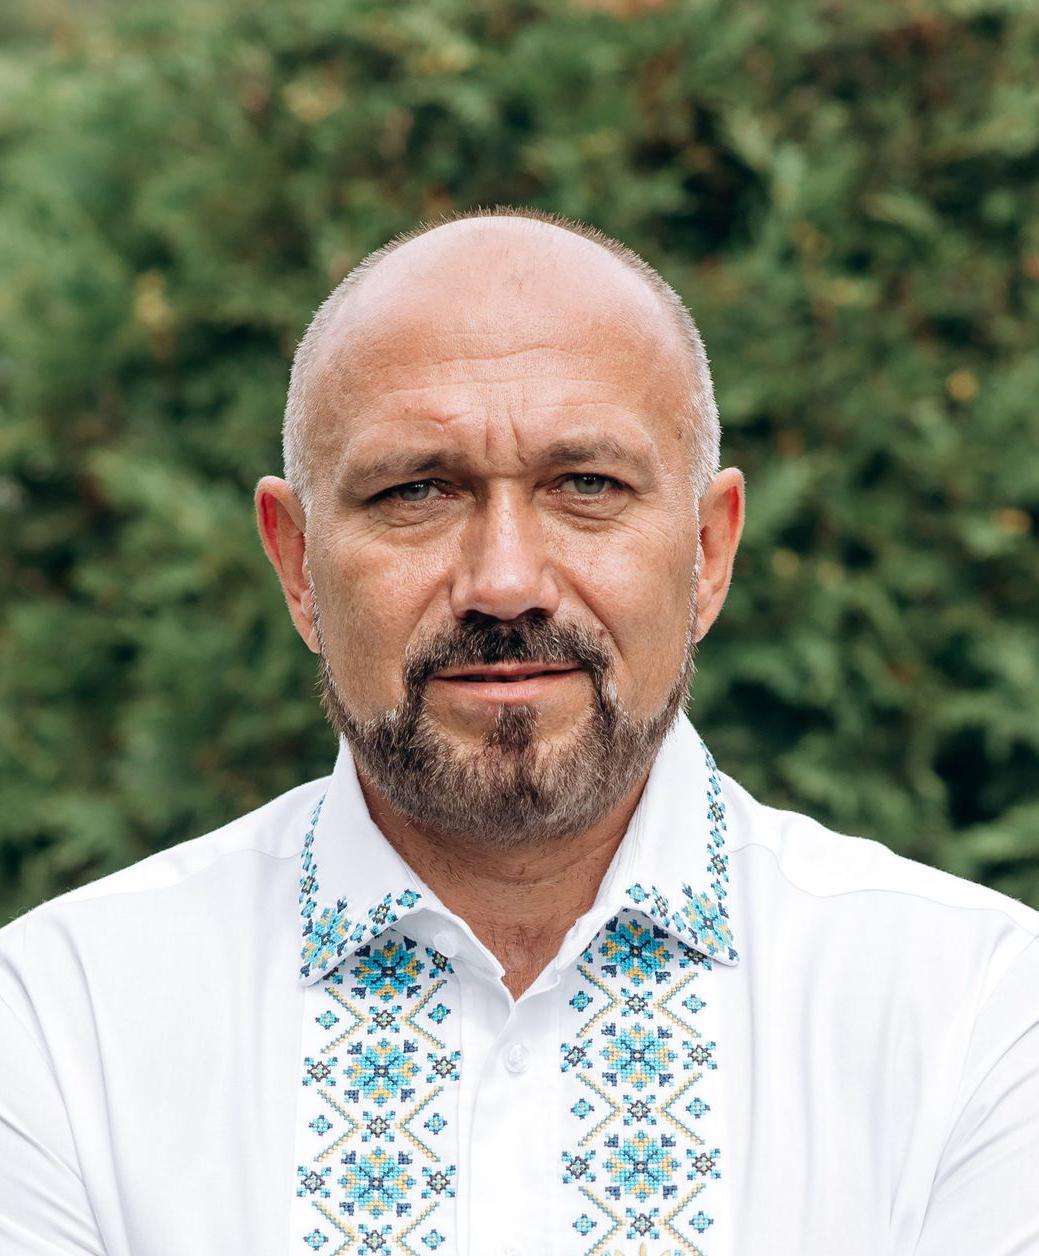 https://galychyna.if.ua/wp-content/uploads/2021/02/Nasalik-3-1.jpg